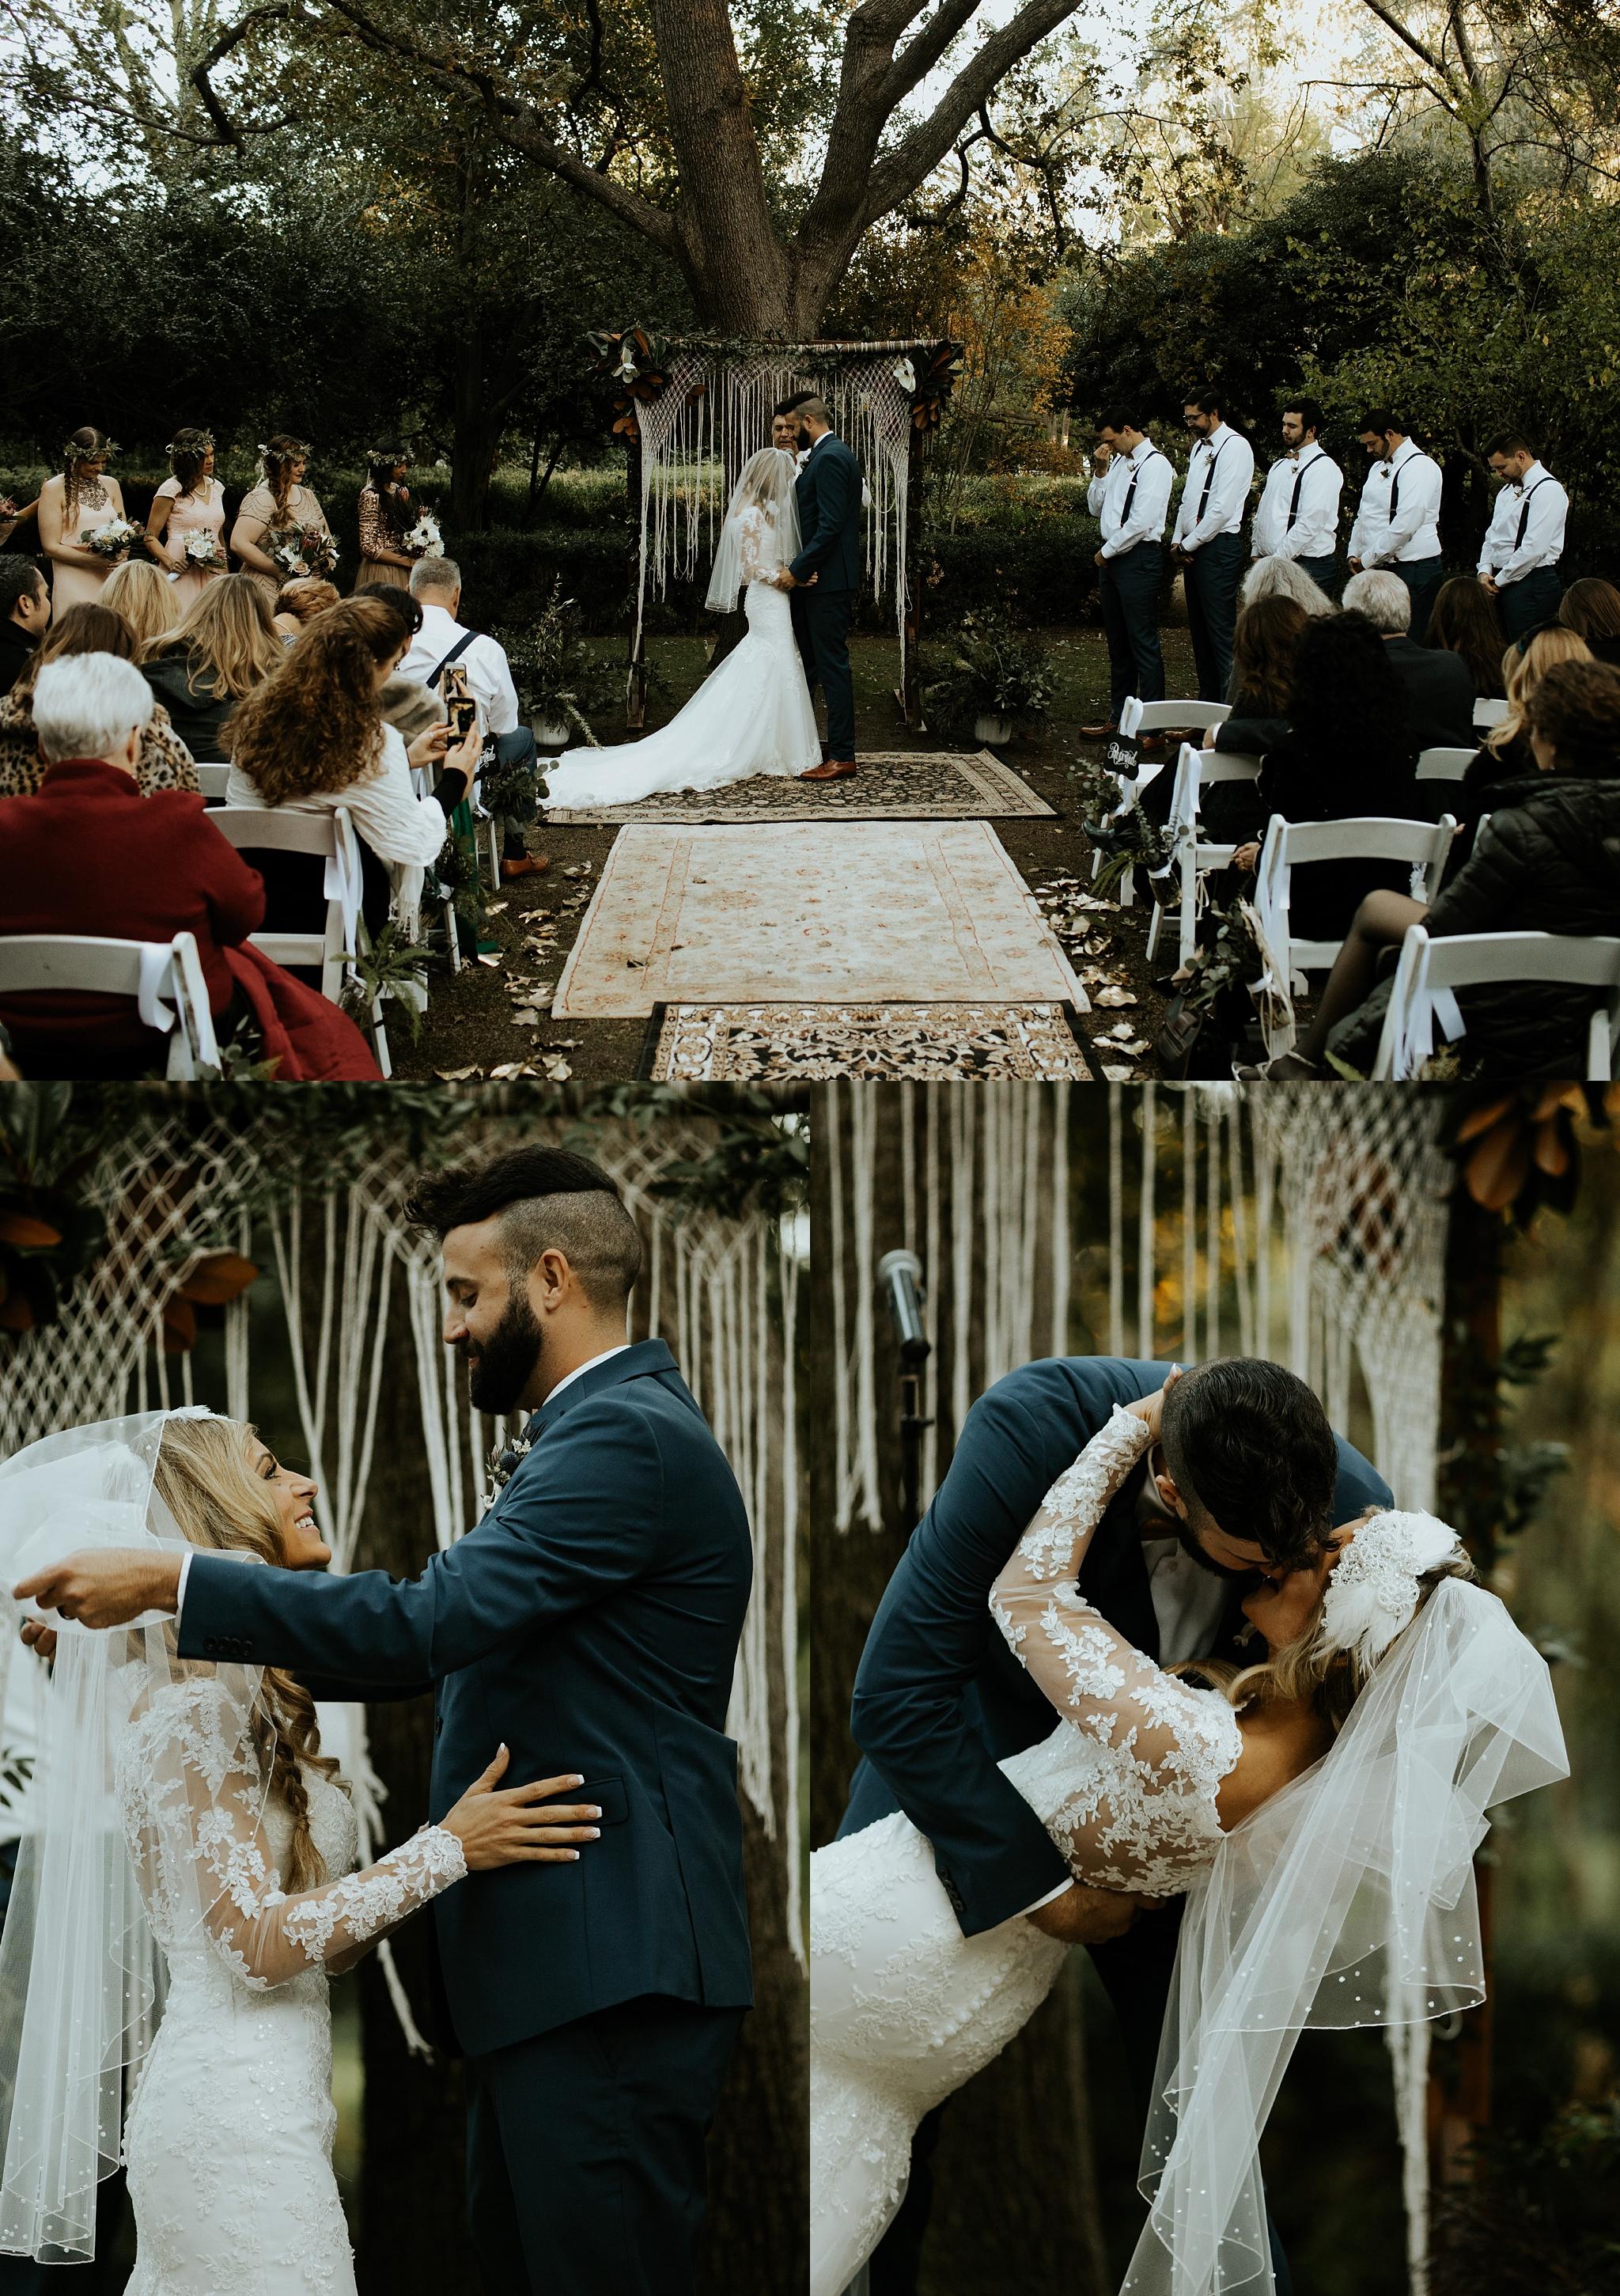 Bohemian Orcutt Ranch Wedding in Los Angeles California  - Los Angeles Californai Wedding Photographer_0037.jpg